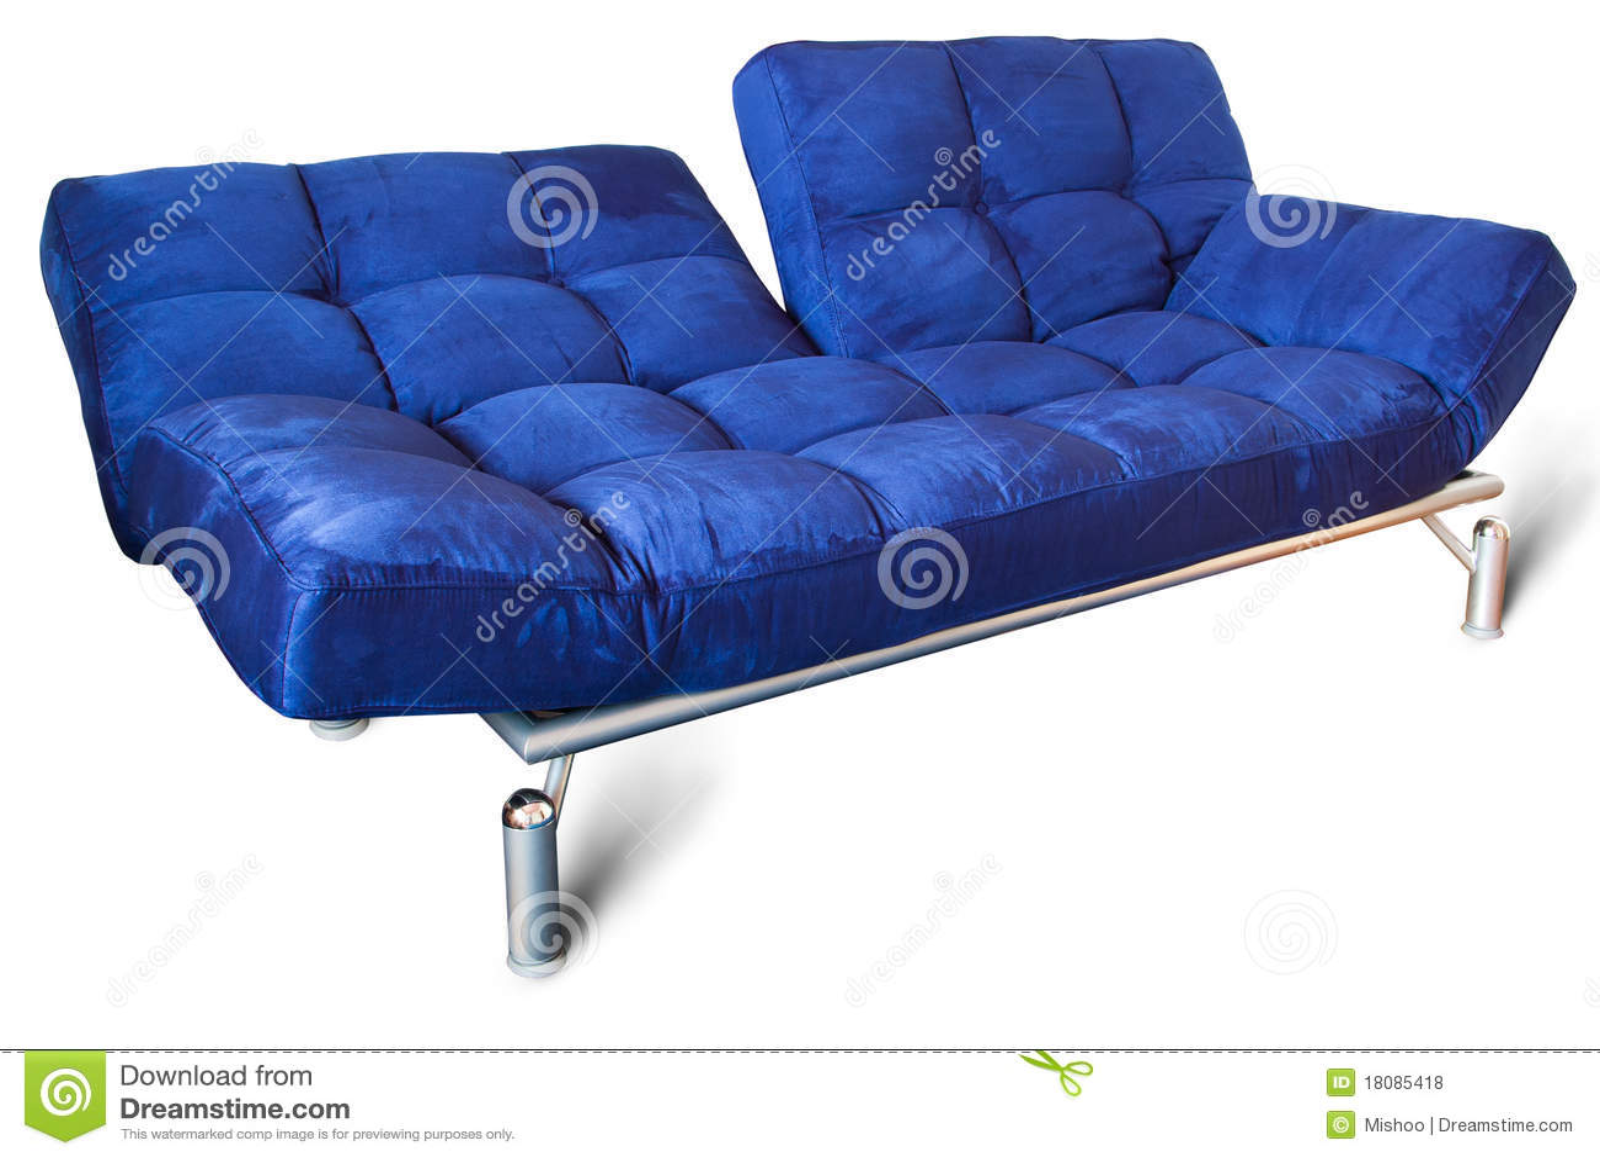 Blauwe bank woonkamer ~ artikill.com